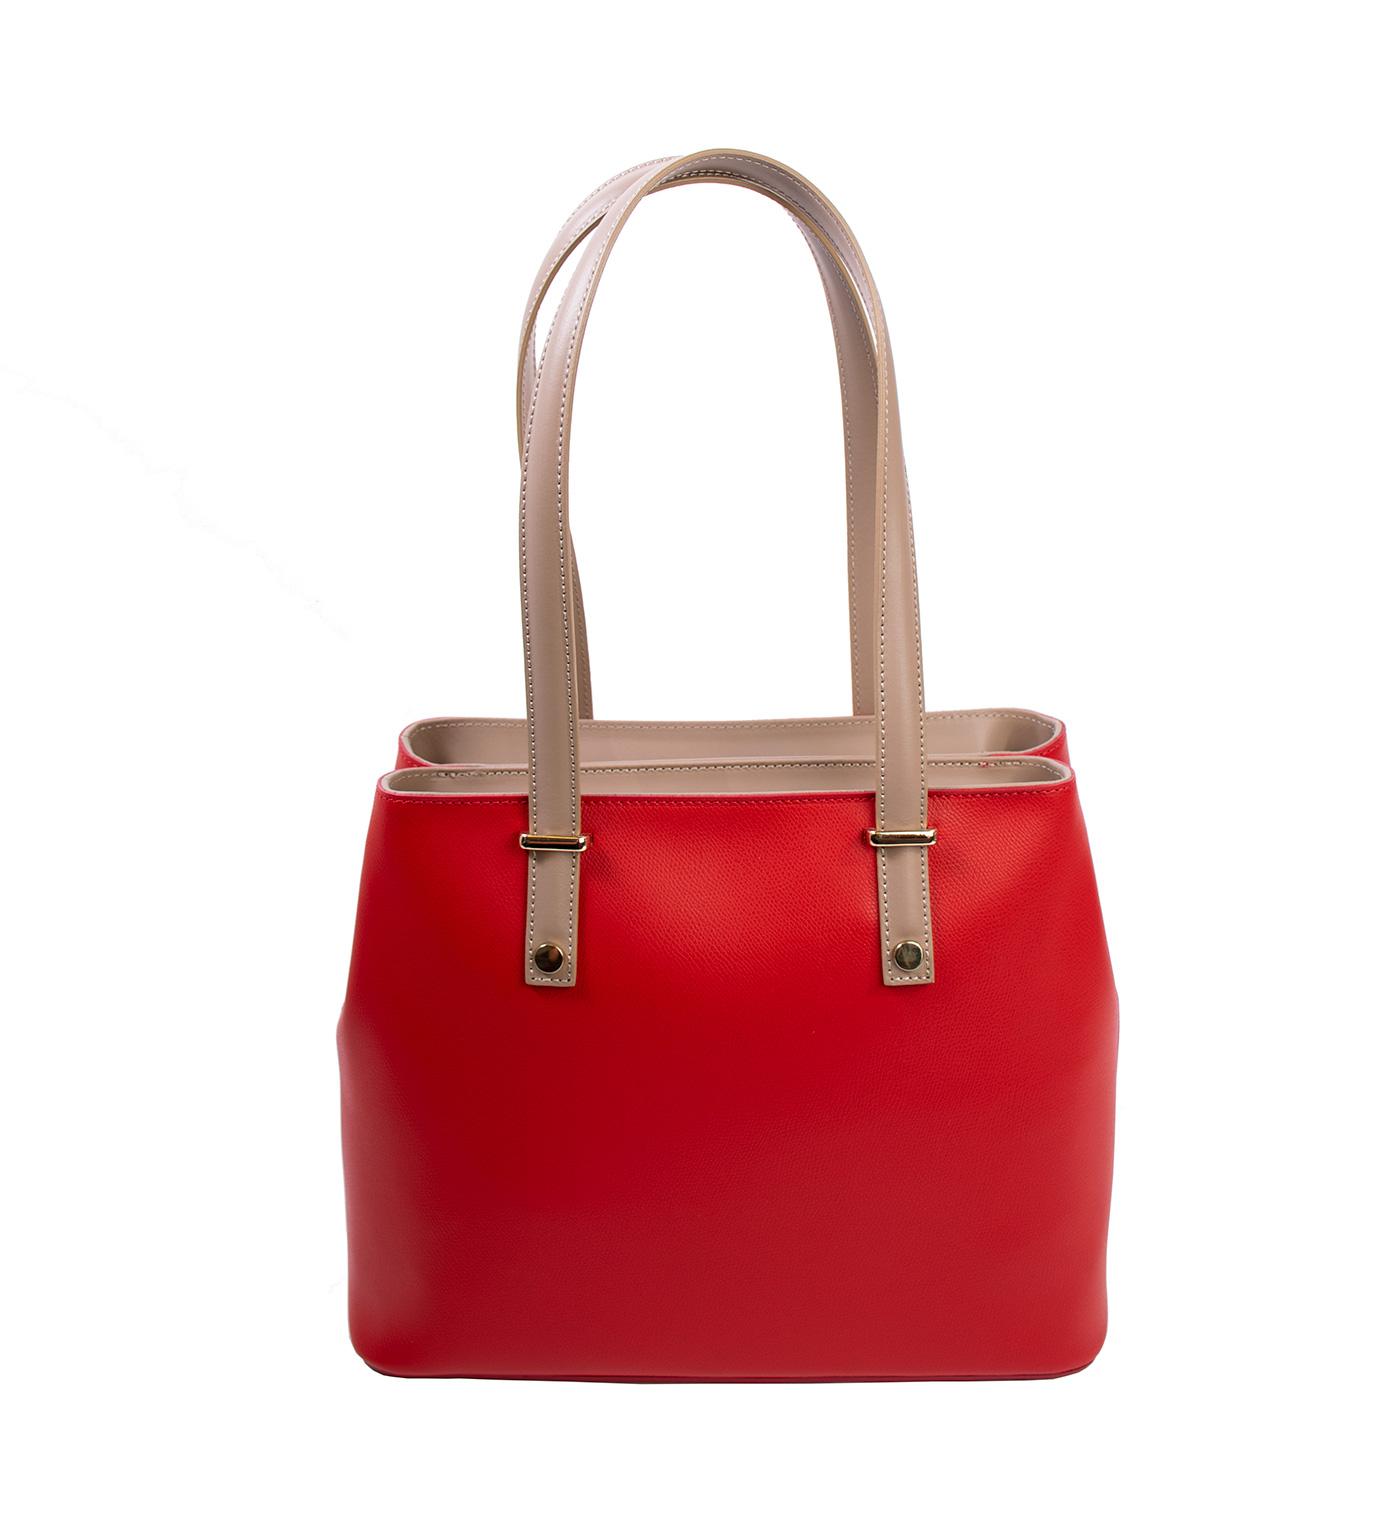 Bags and more Donnylyn Piros Női Bőr Válltáska